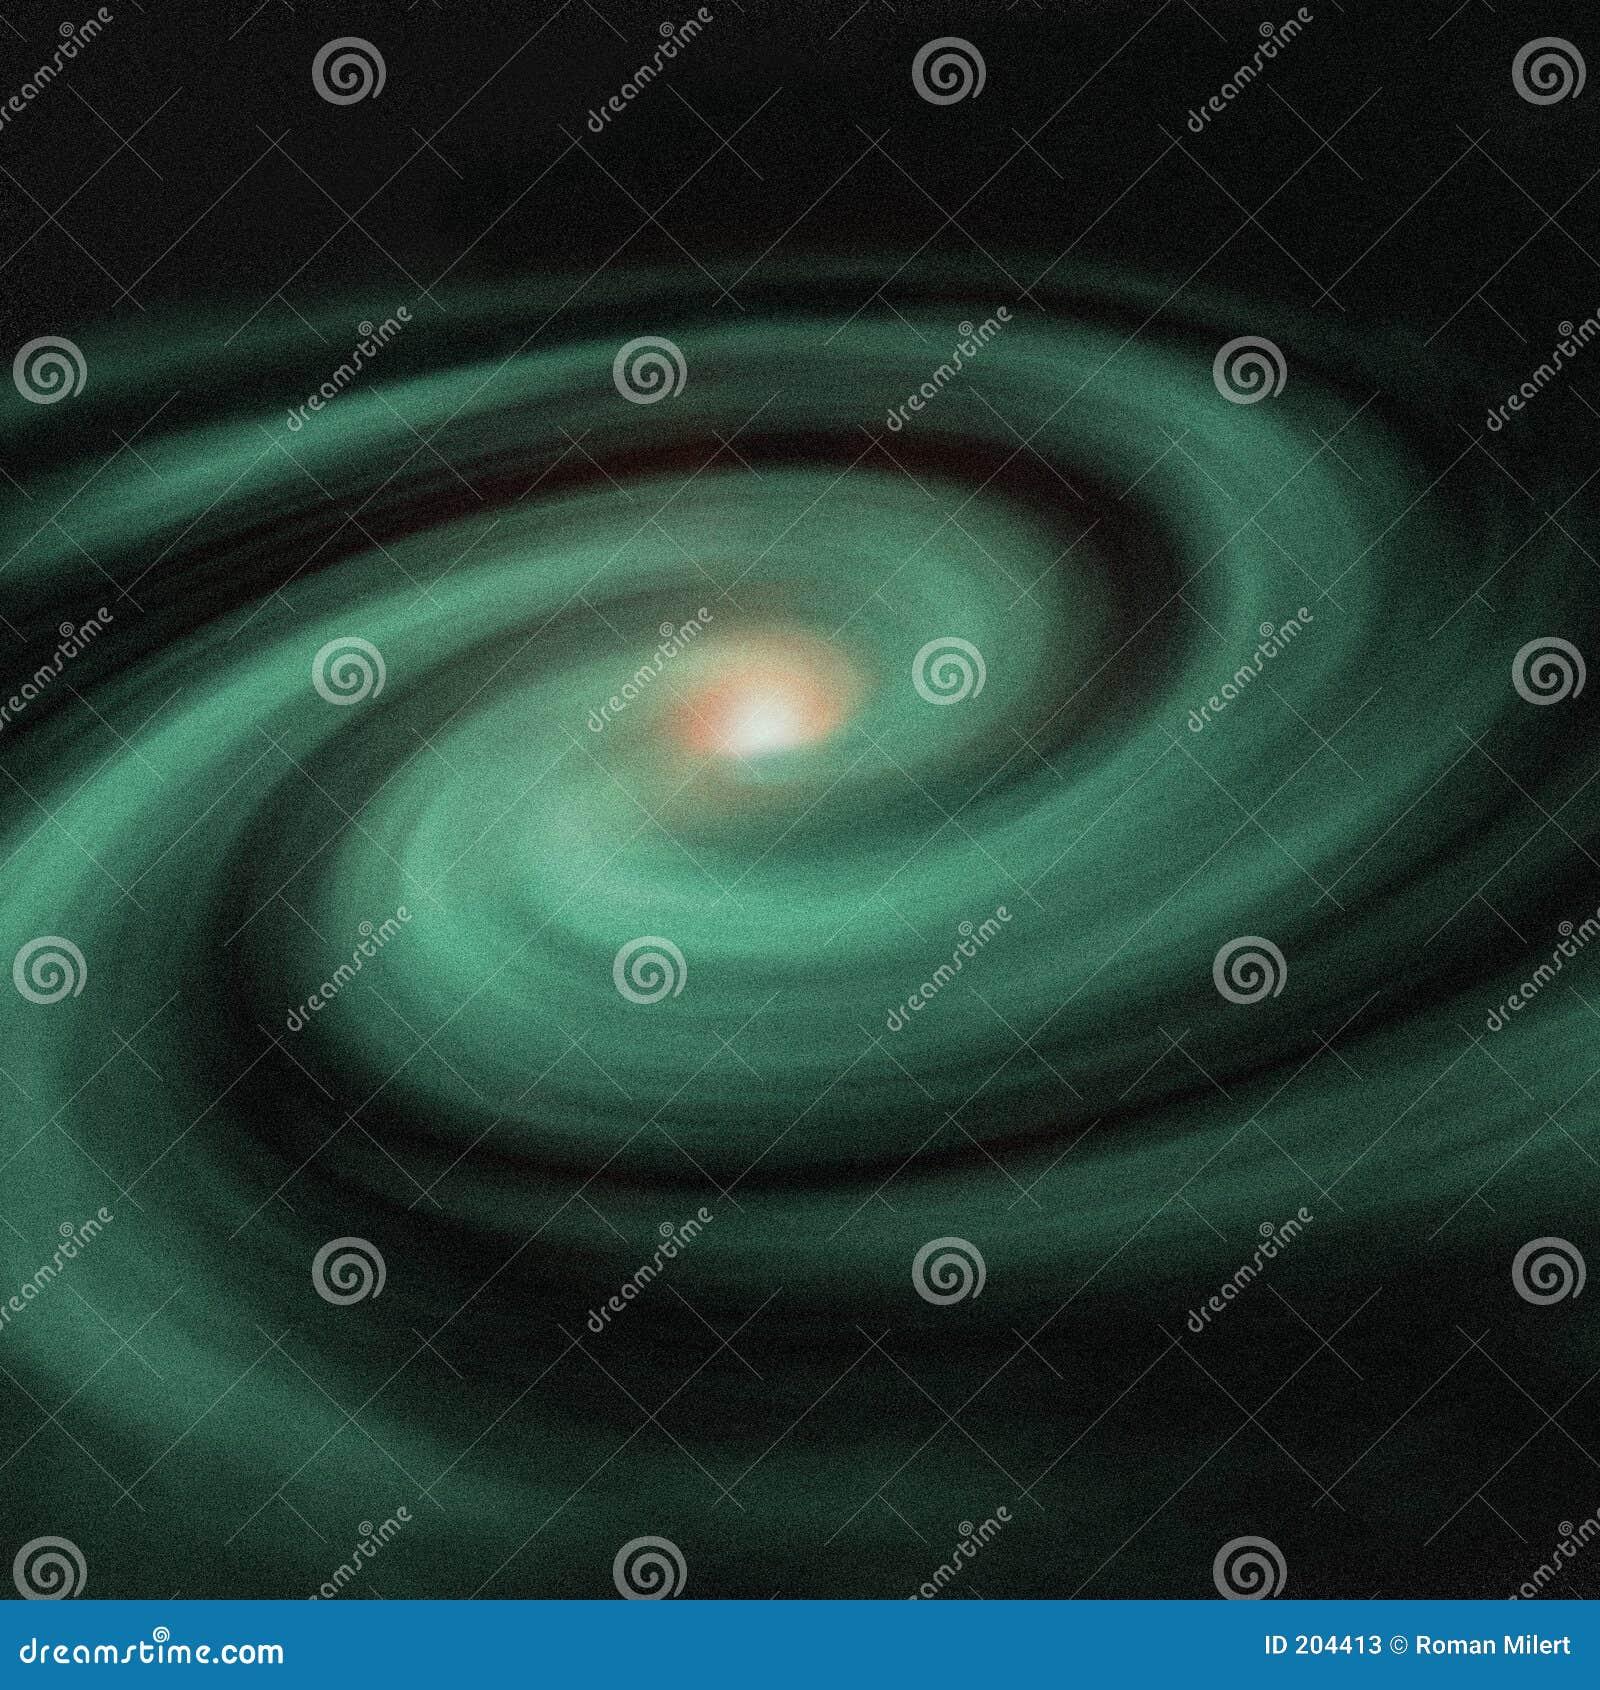 Green galaktyki.